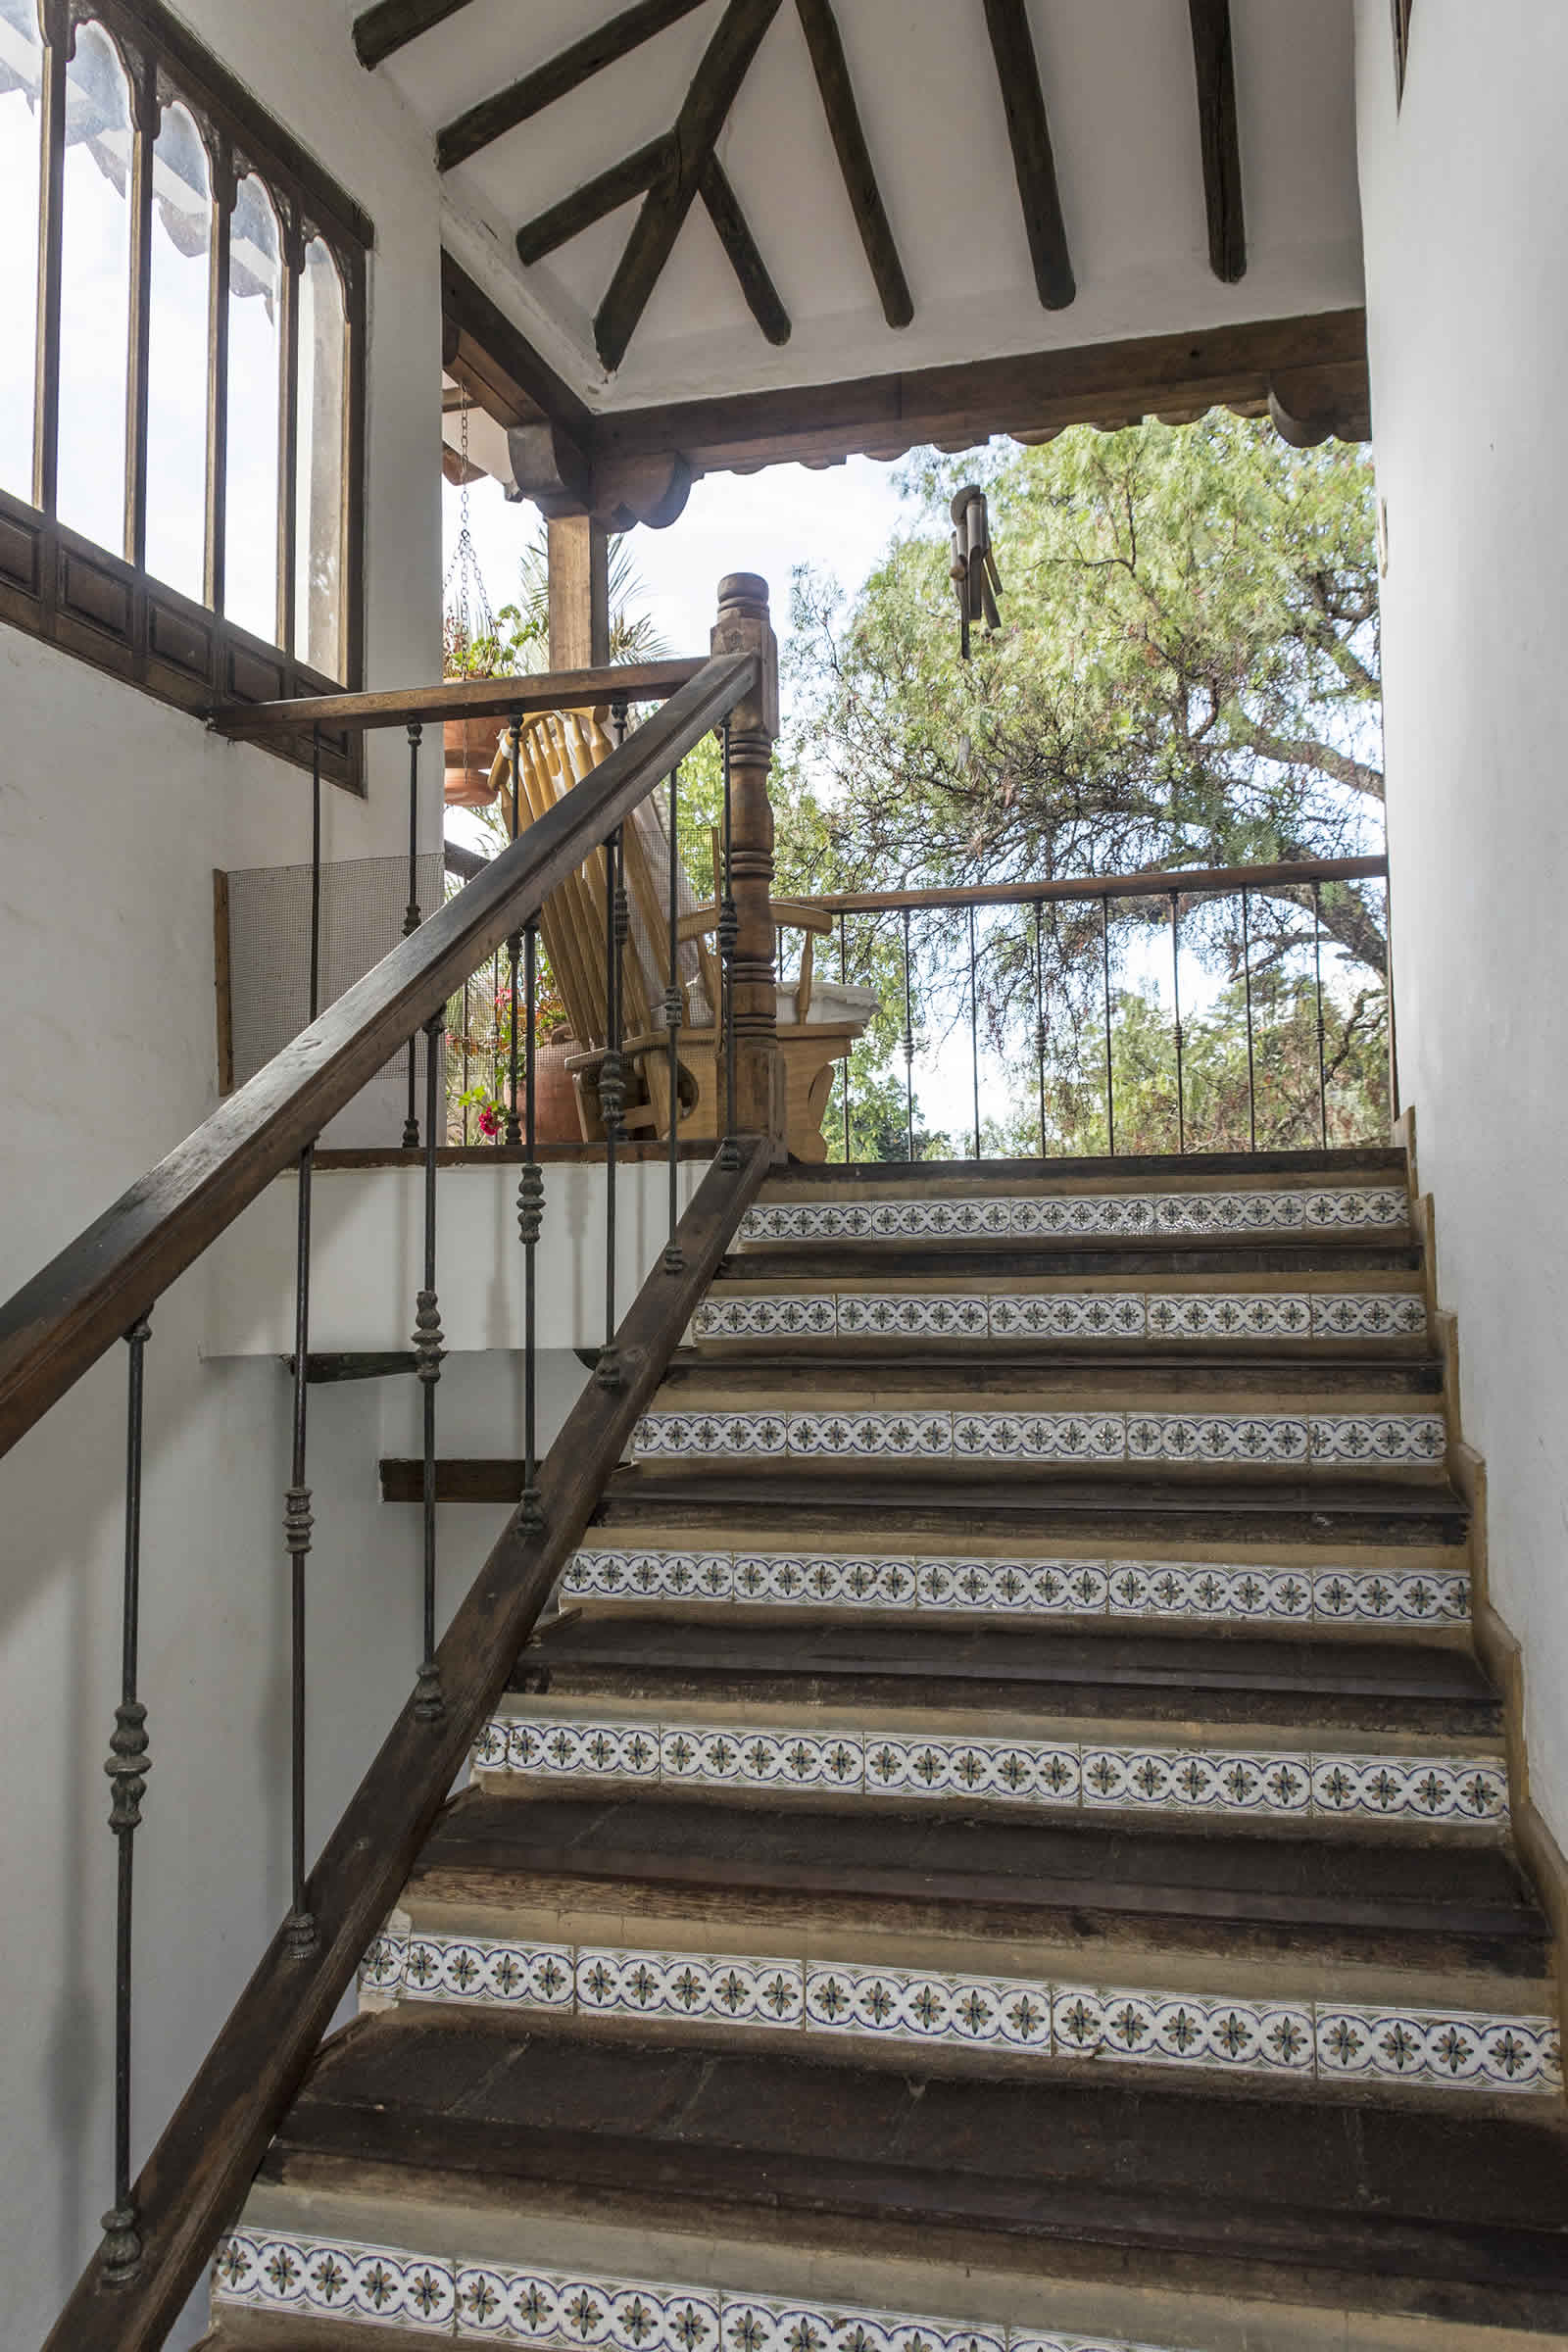 Escaleras casa oasis alquiler villa de leyva